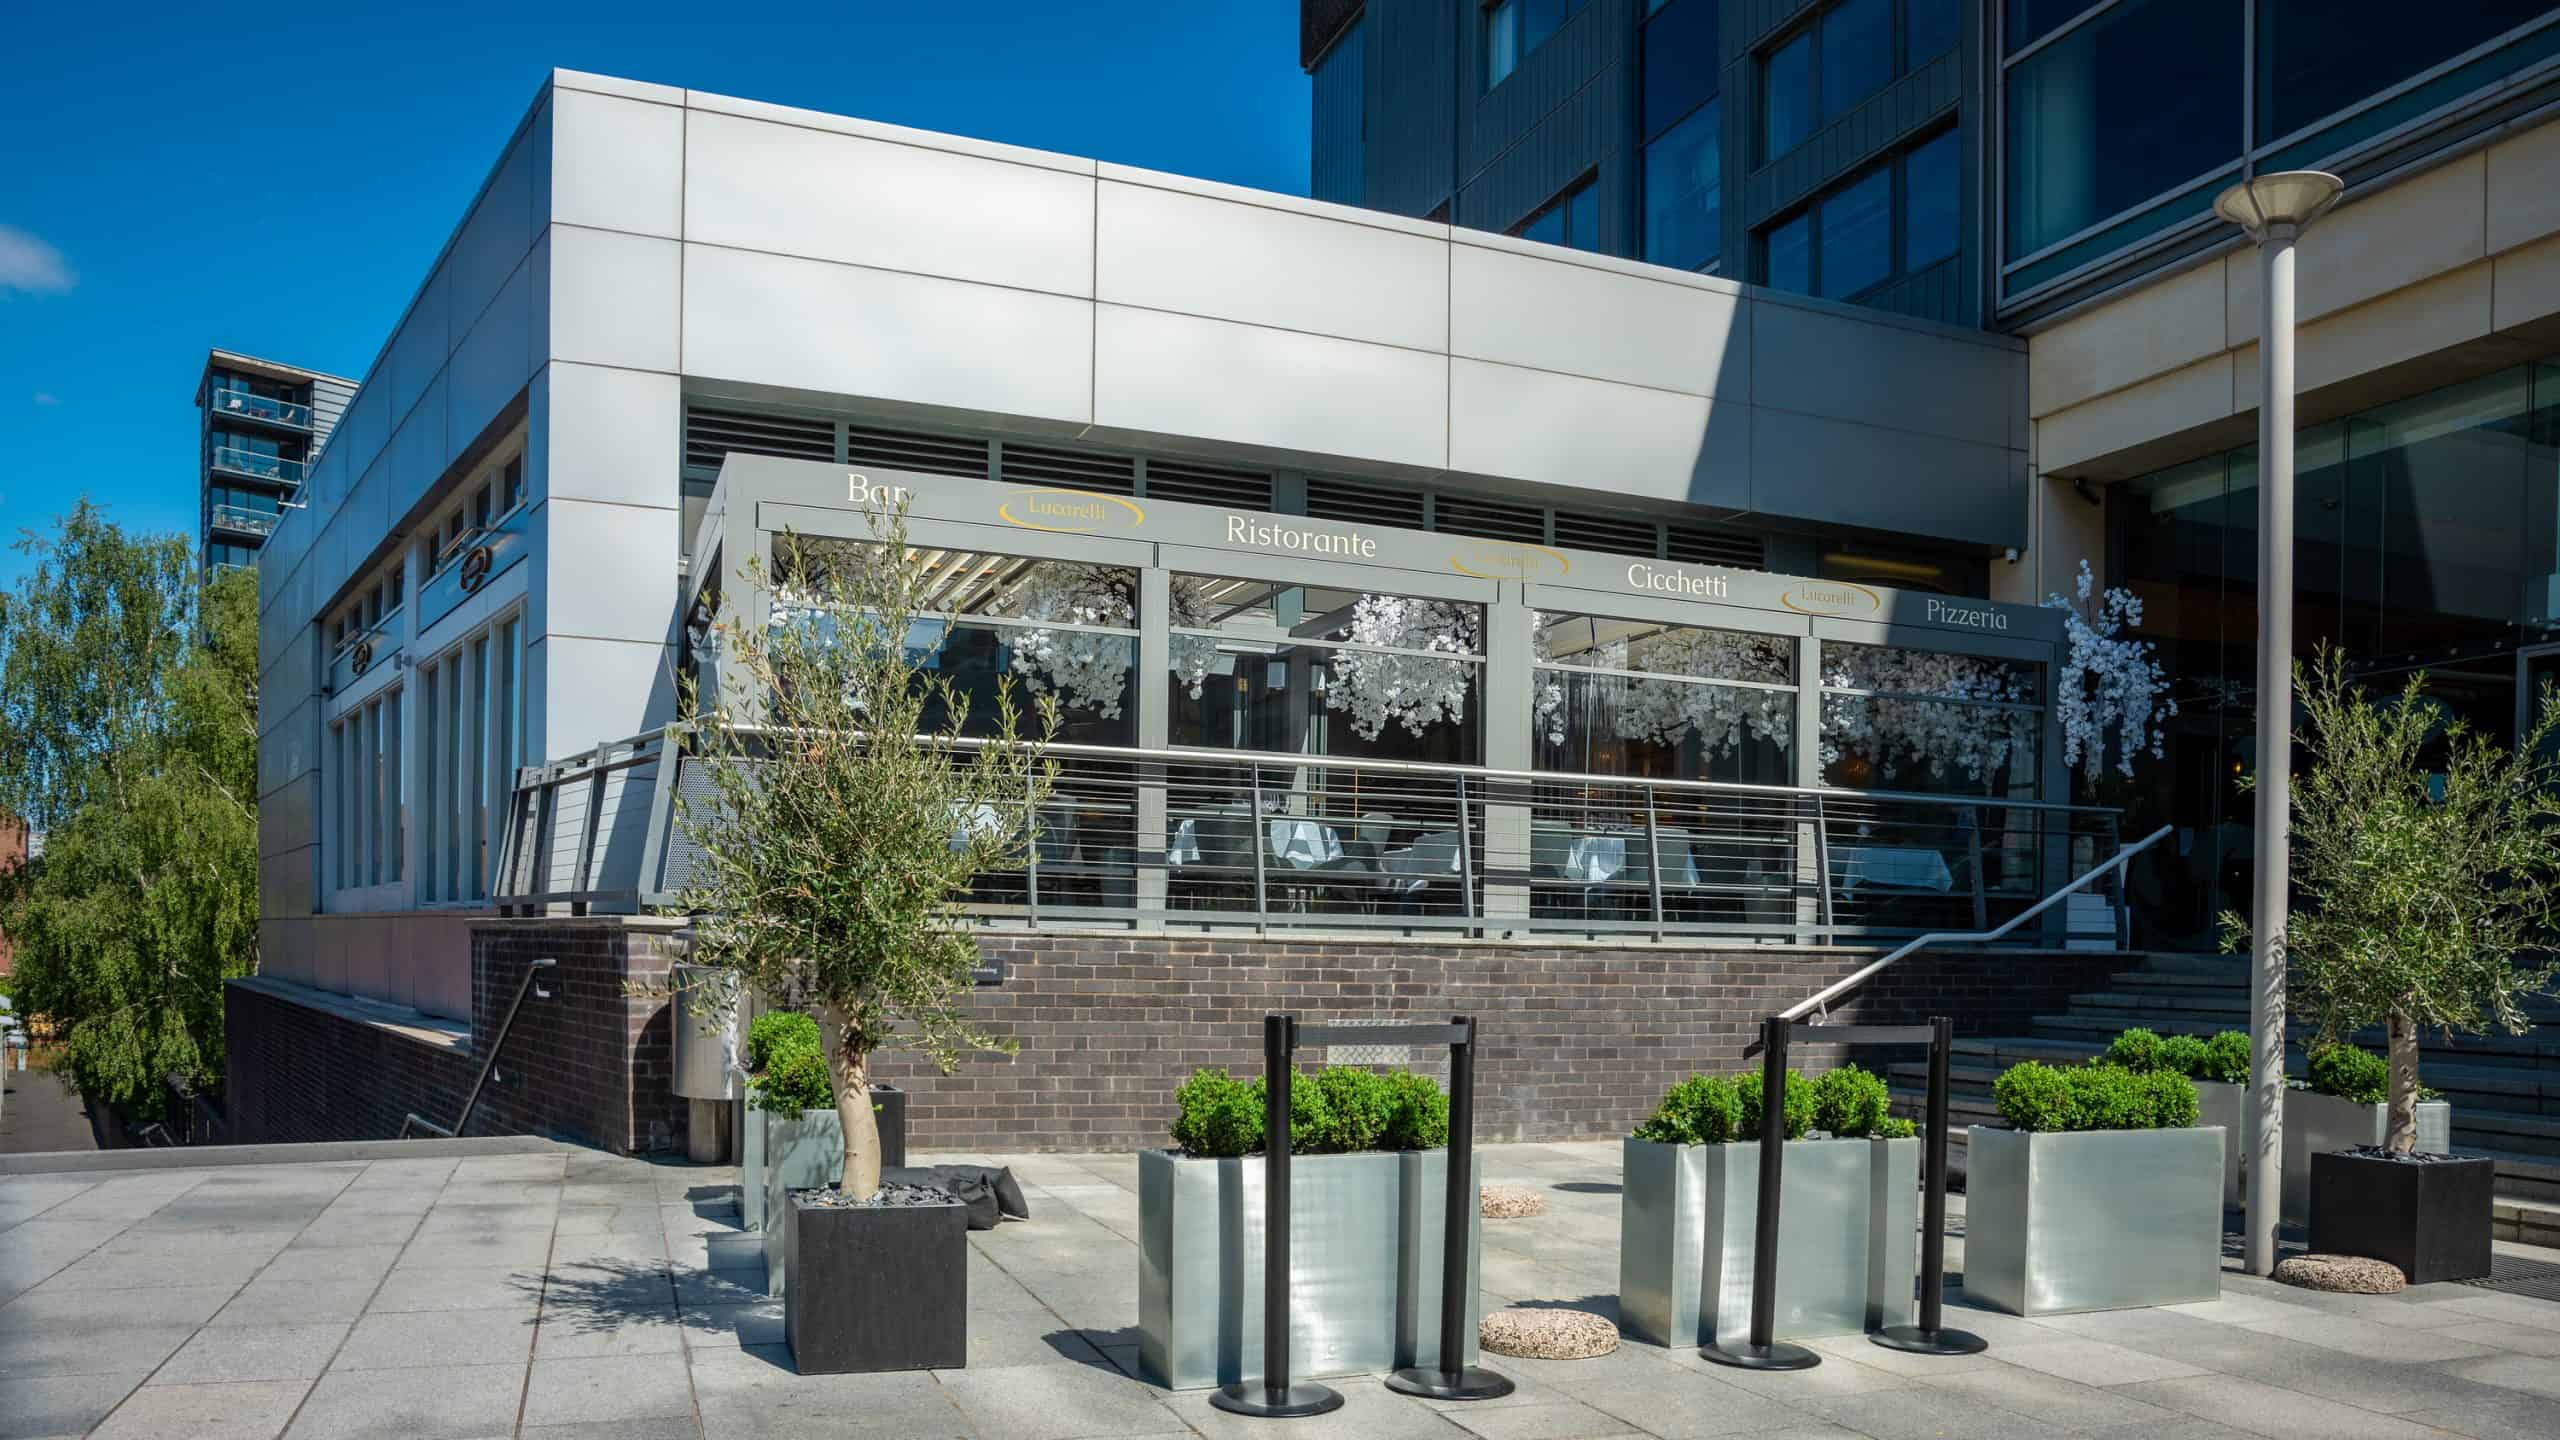 Lucarelli facade, the mailbox, bio-climatic pergola, flair studio design